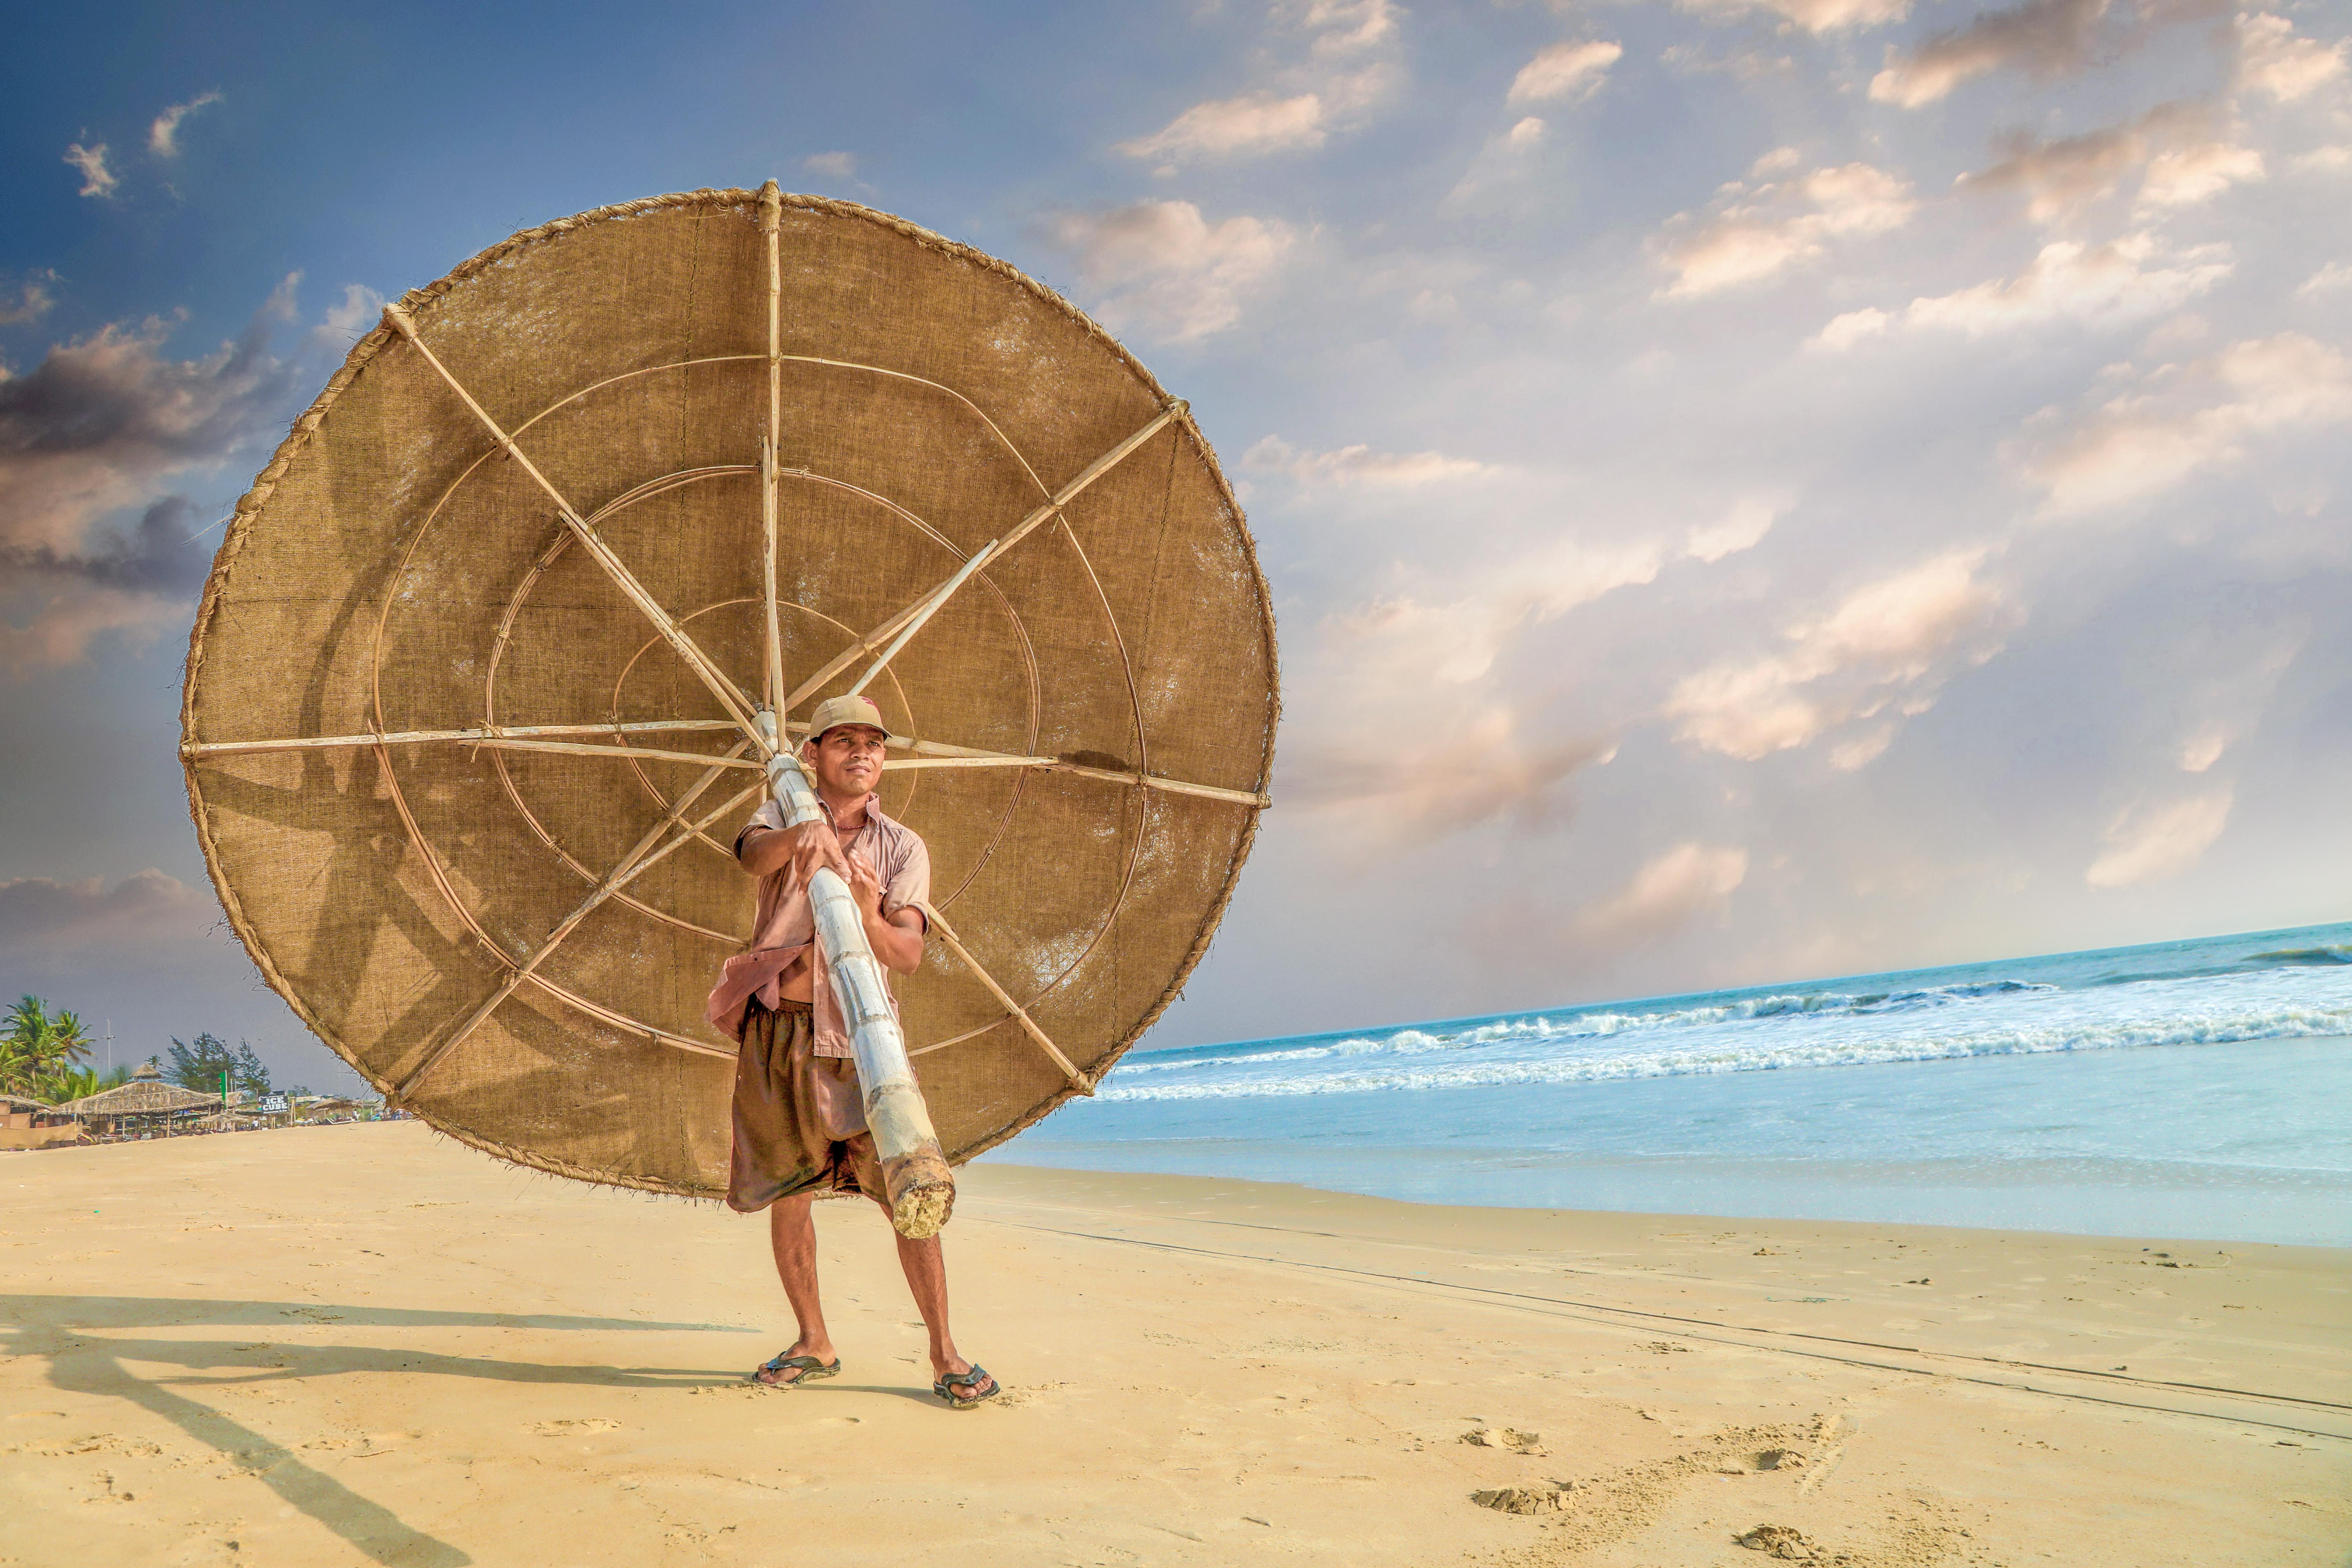 https://bubo.sk/uploads/Krajiny_sveta/India/benaulim-beach-goa-1b8a5804.jpg